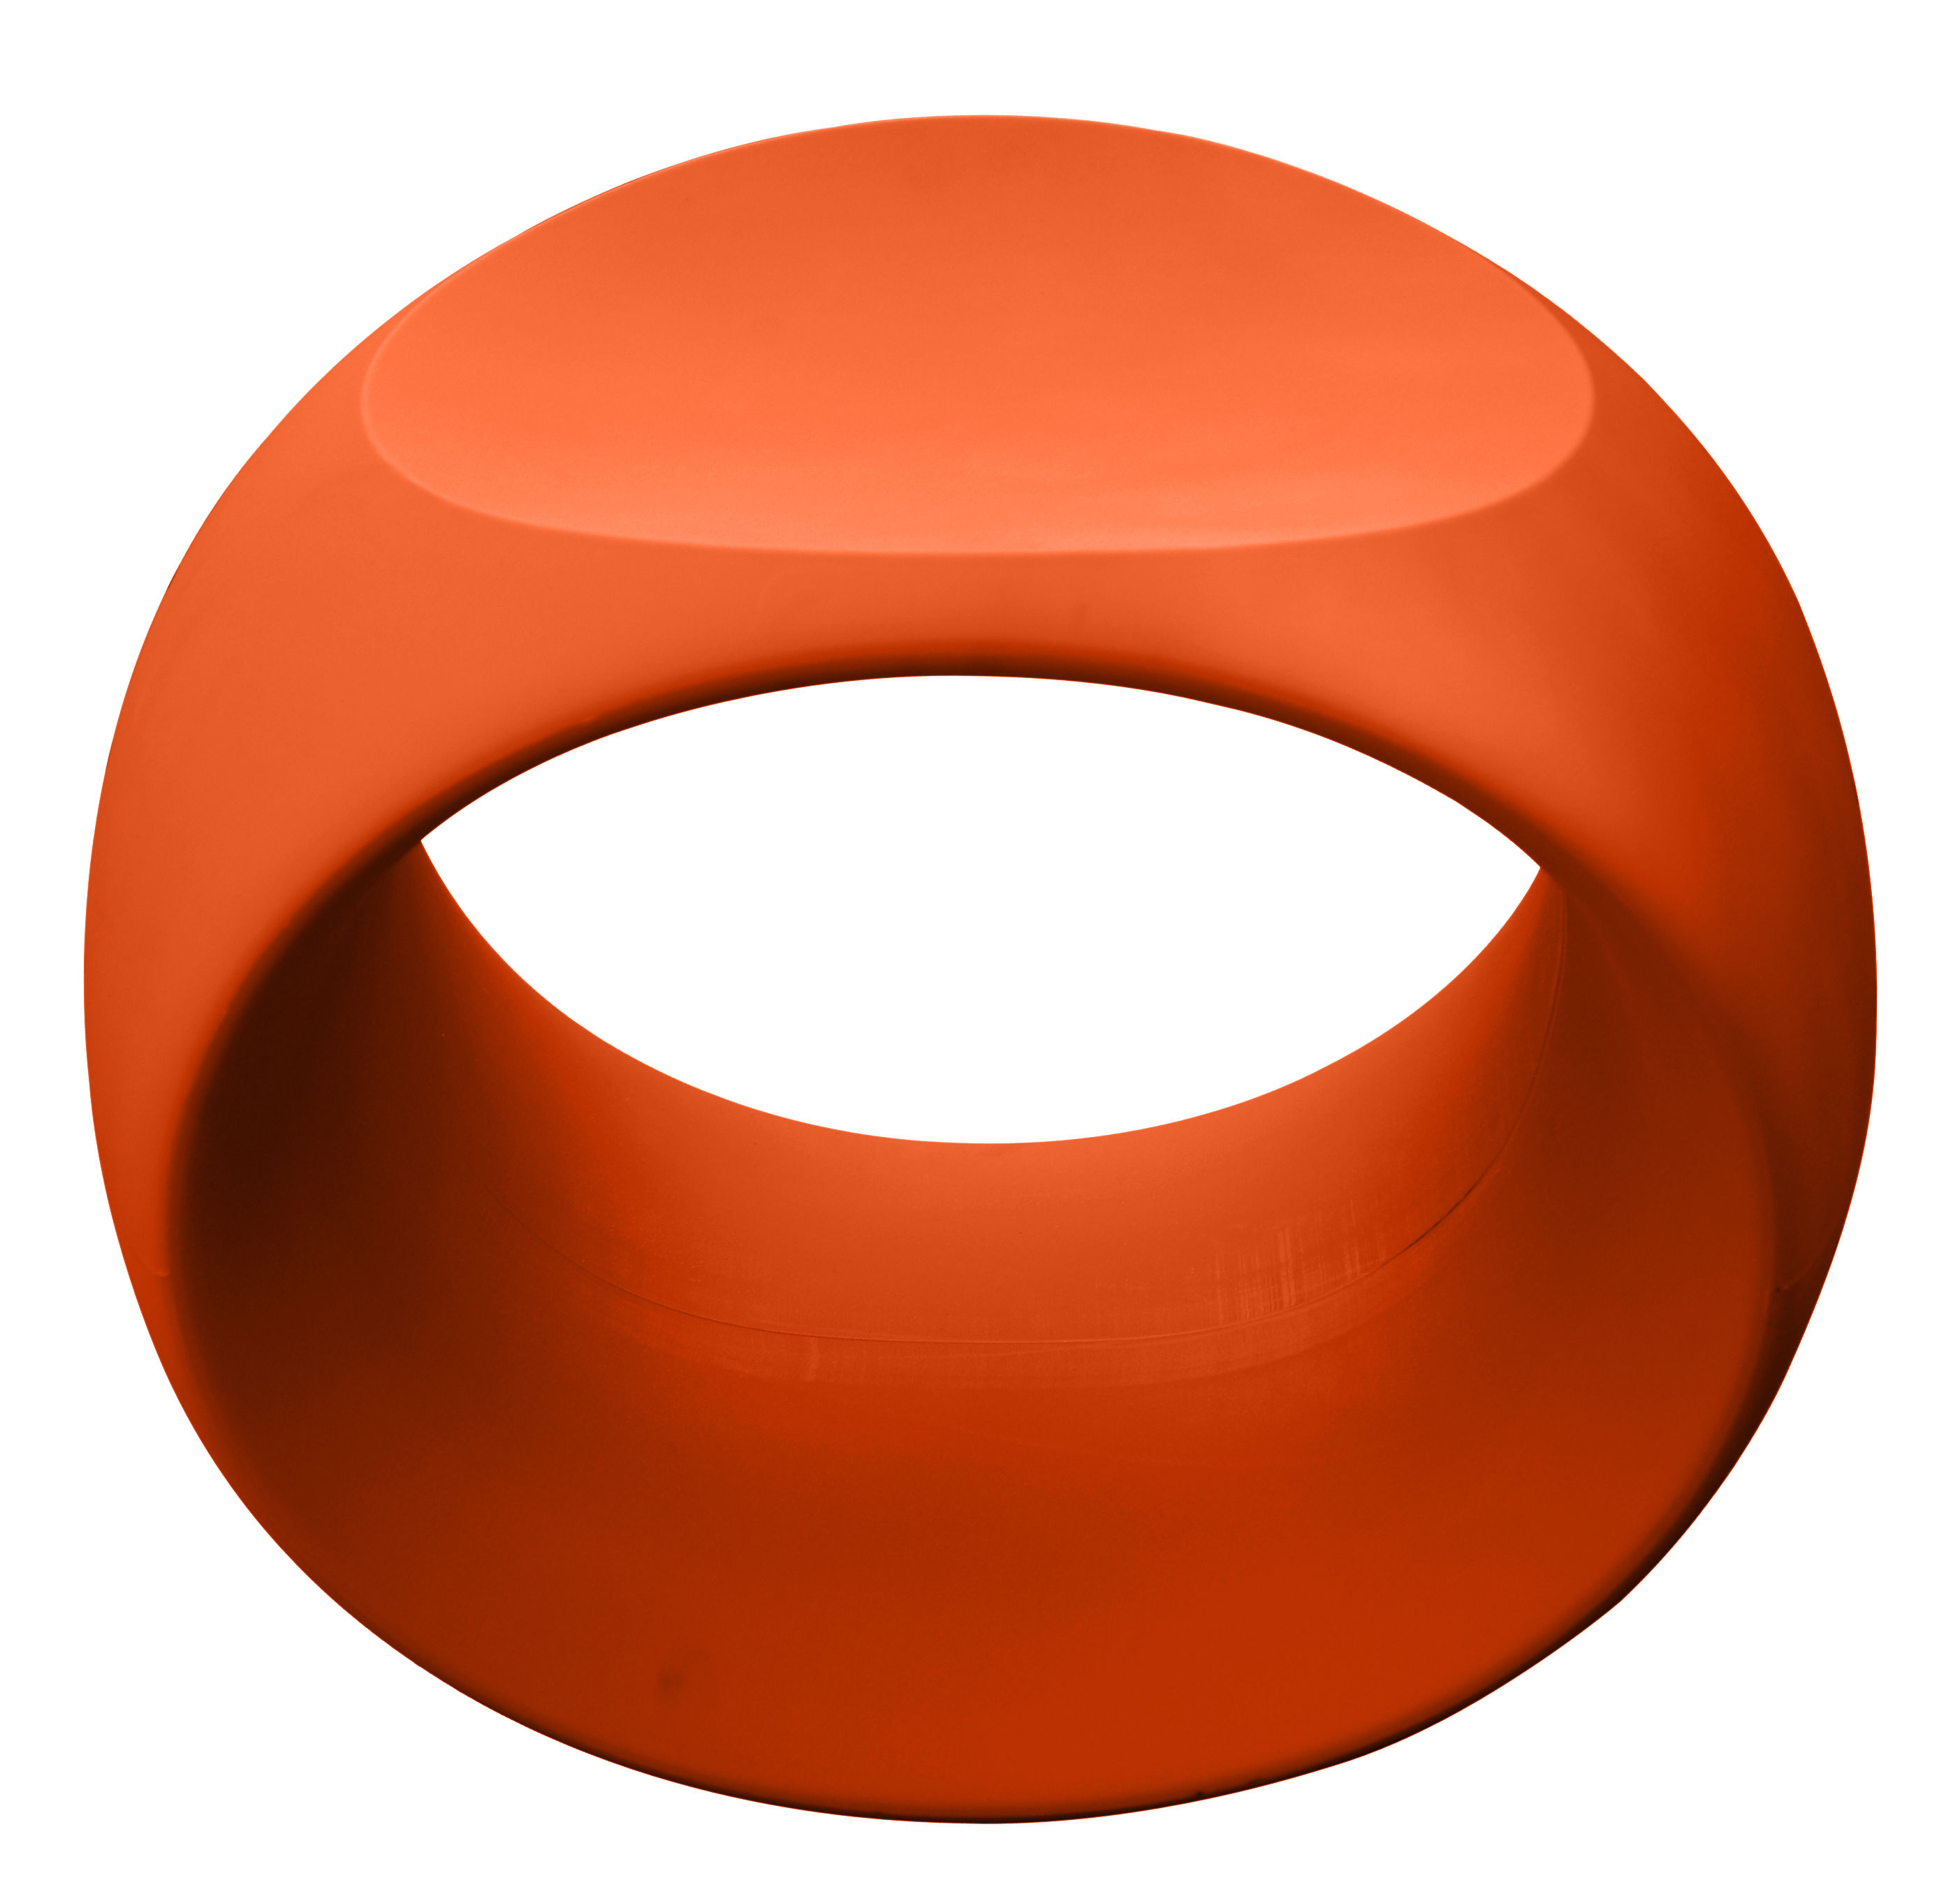 Mobilier - Tabourets bas - Tabouret Cero / Plastique - Serralunga - Orange - Polyéthylène rotomoulé